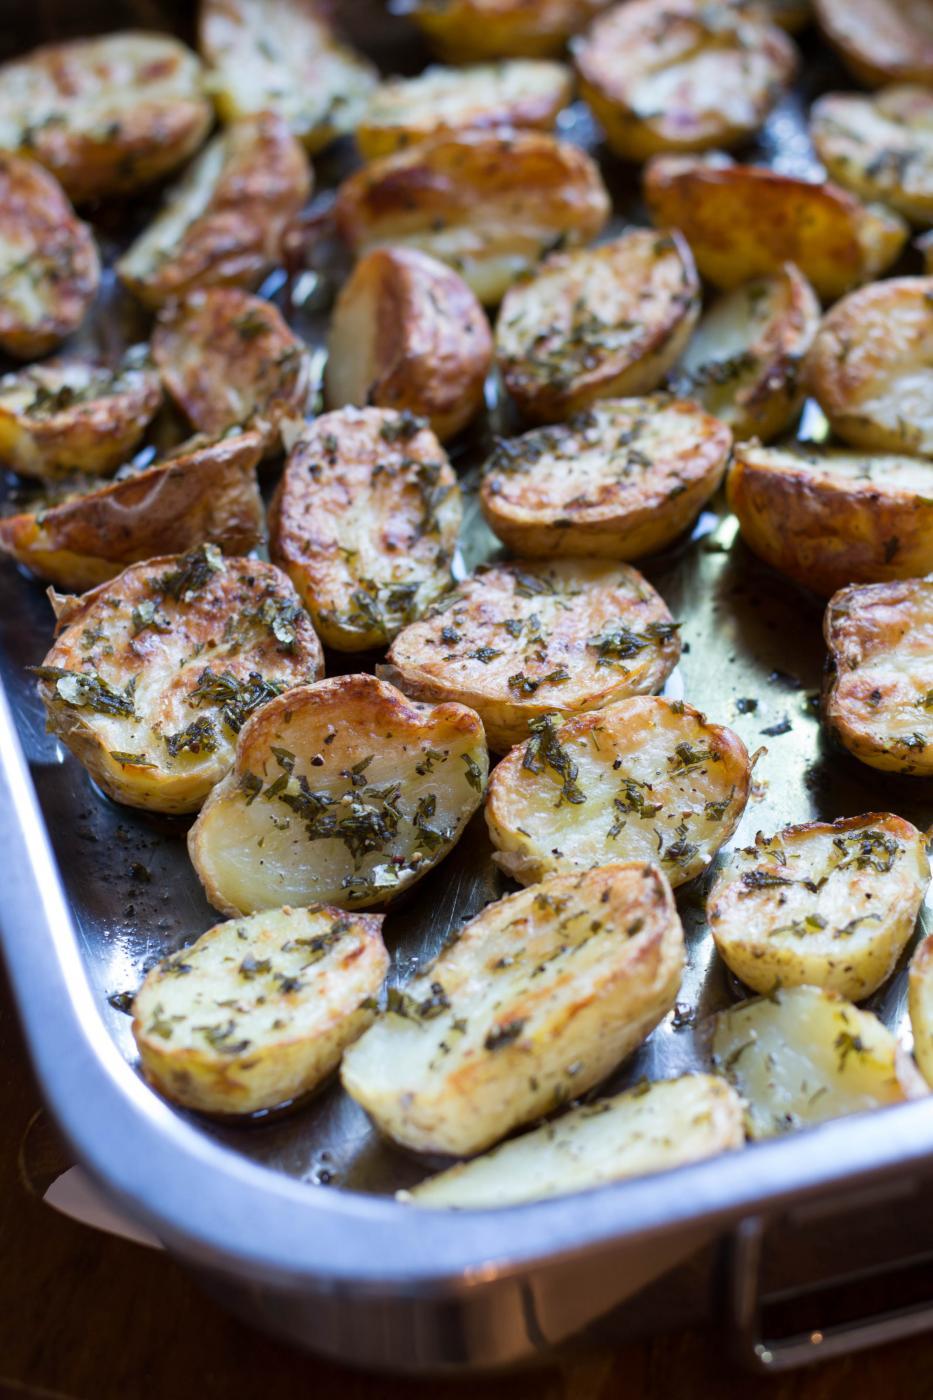 Paahdetut uudet perunat ja grillattu parsa